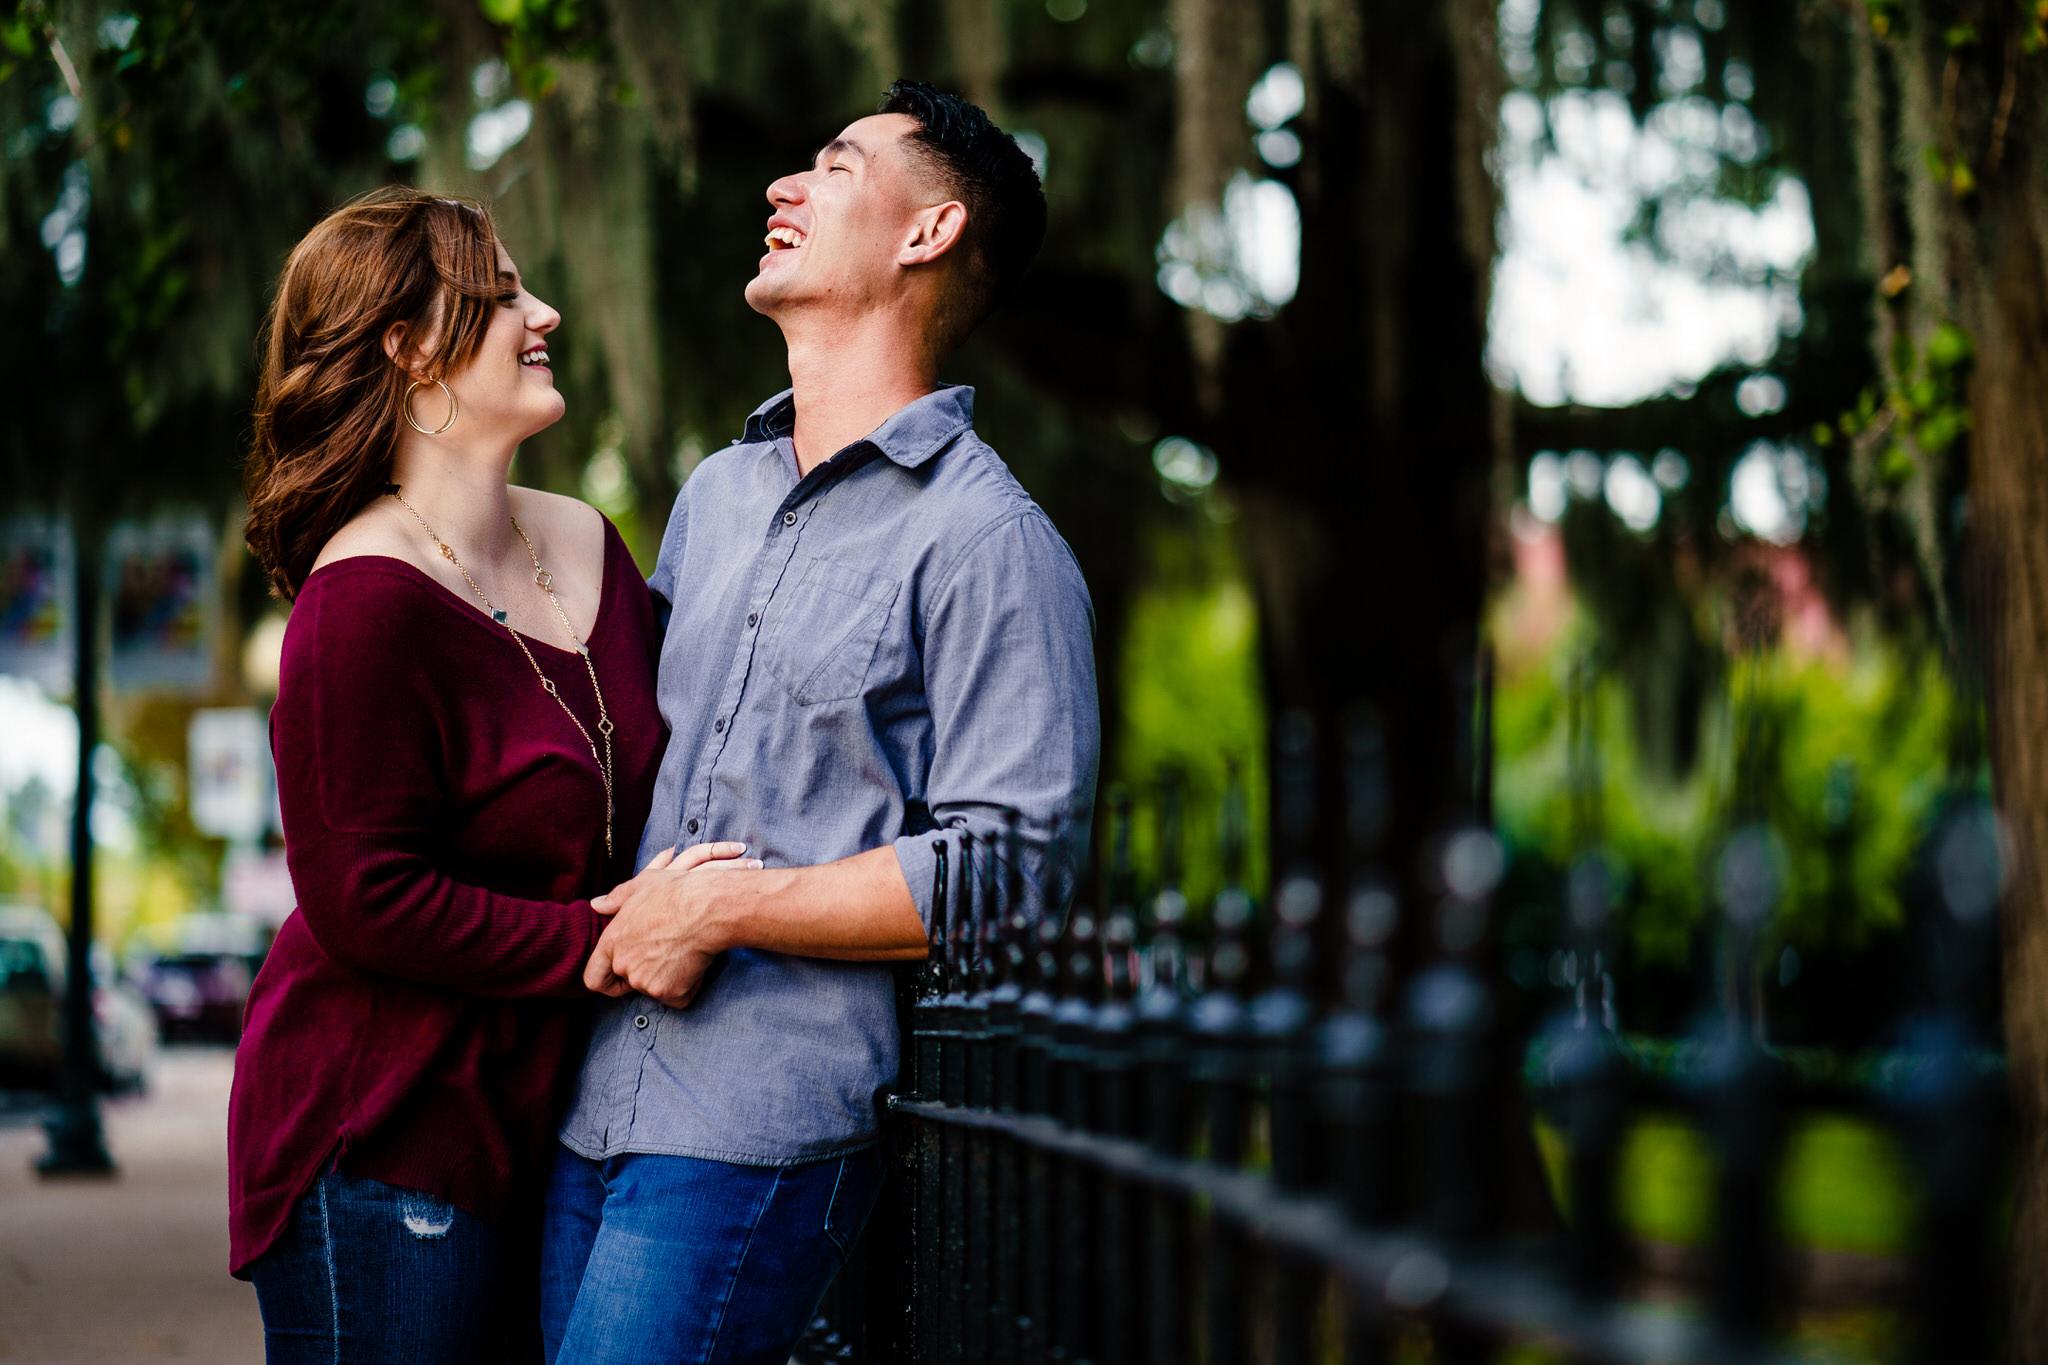 Shelby&Ye-New-Bern-Engagement-Photography-Chad-Winstead-006-1.jpg